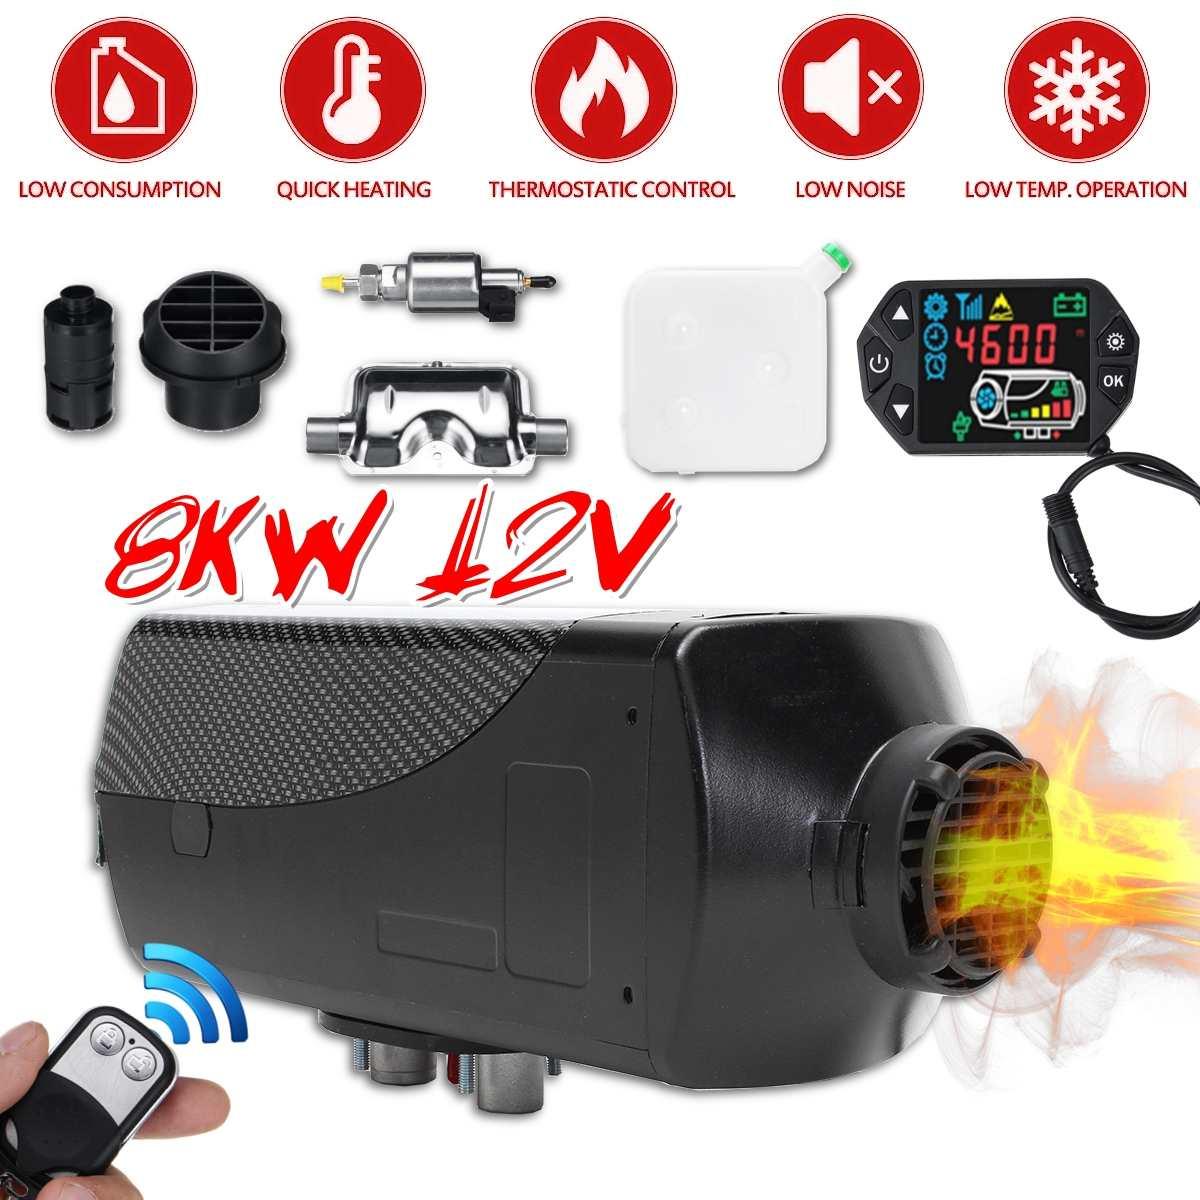 12 v 8kw carro diesels ar aquecedor de estacionamento aquecedor de carro lcd controle remoto monitor interruptor + silenciadores para caminhões ônibus reboque